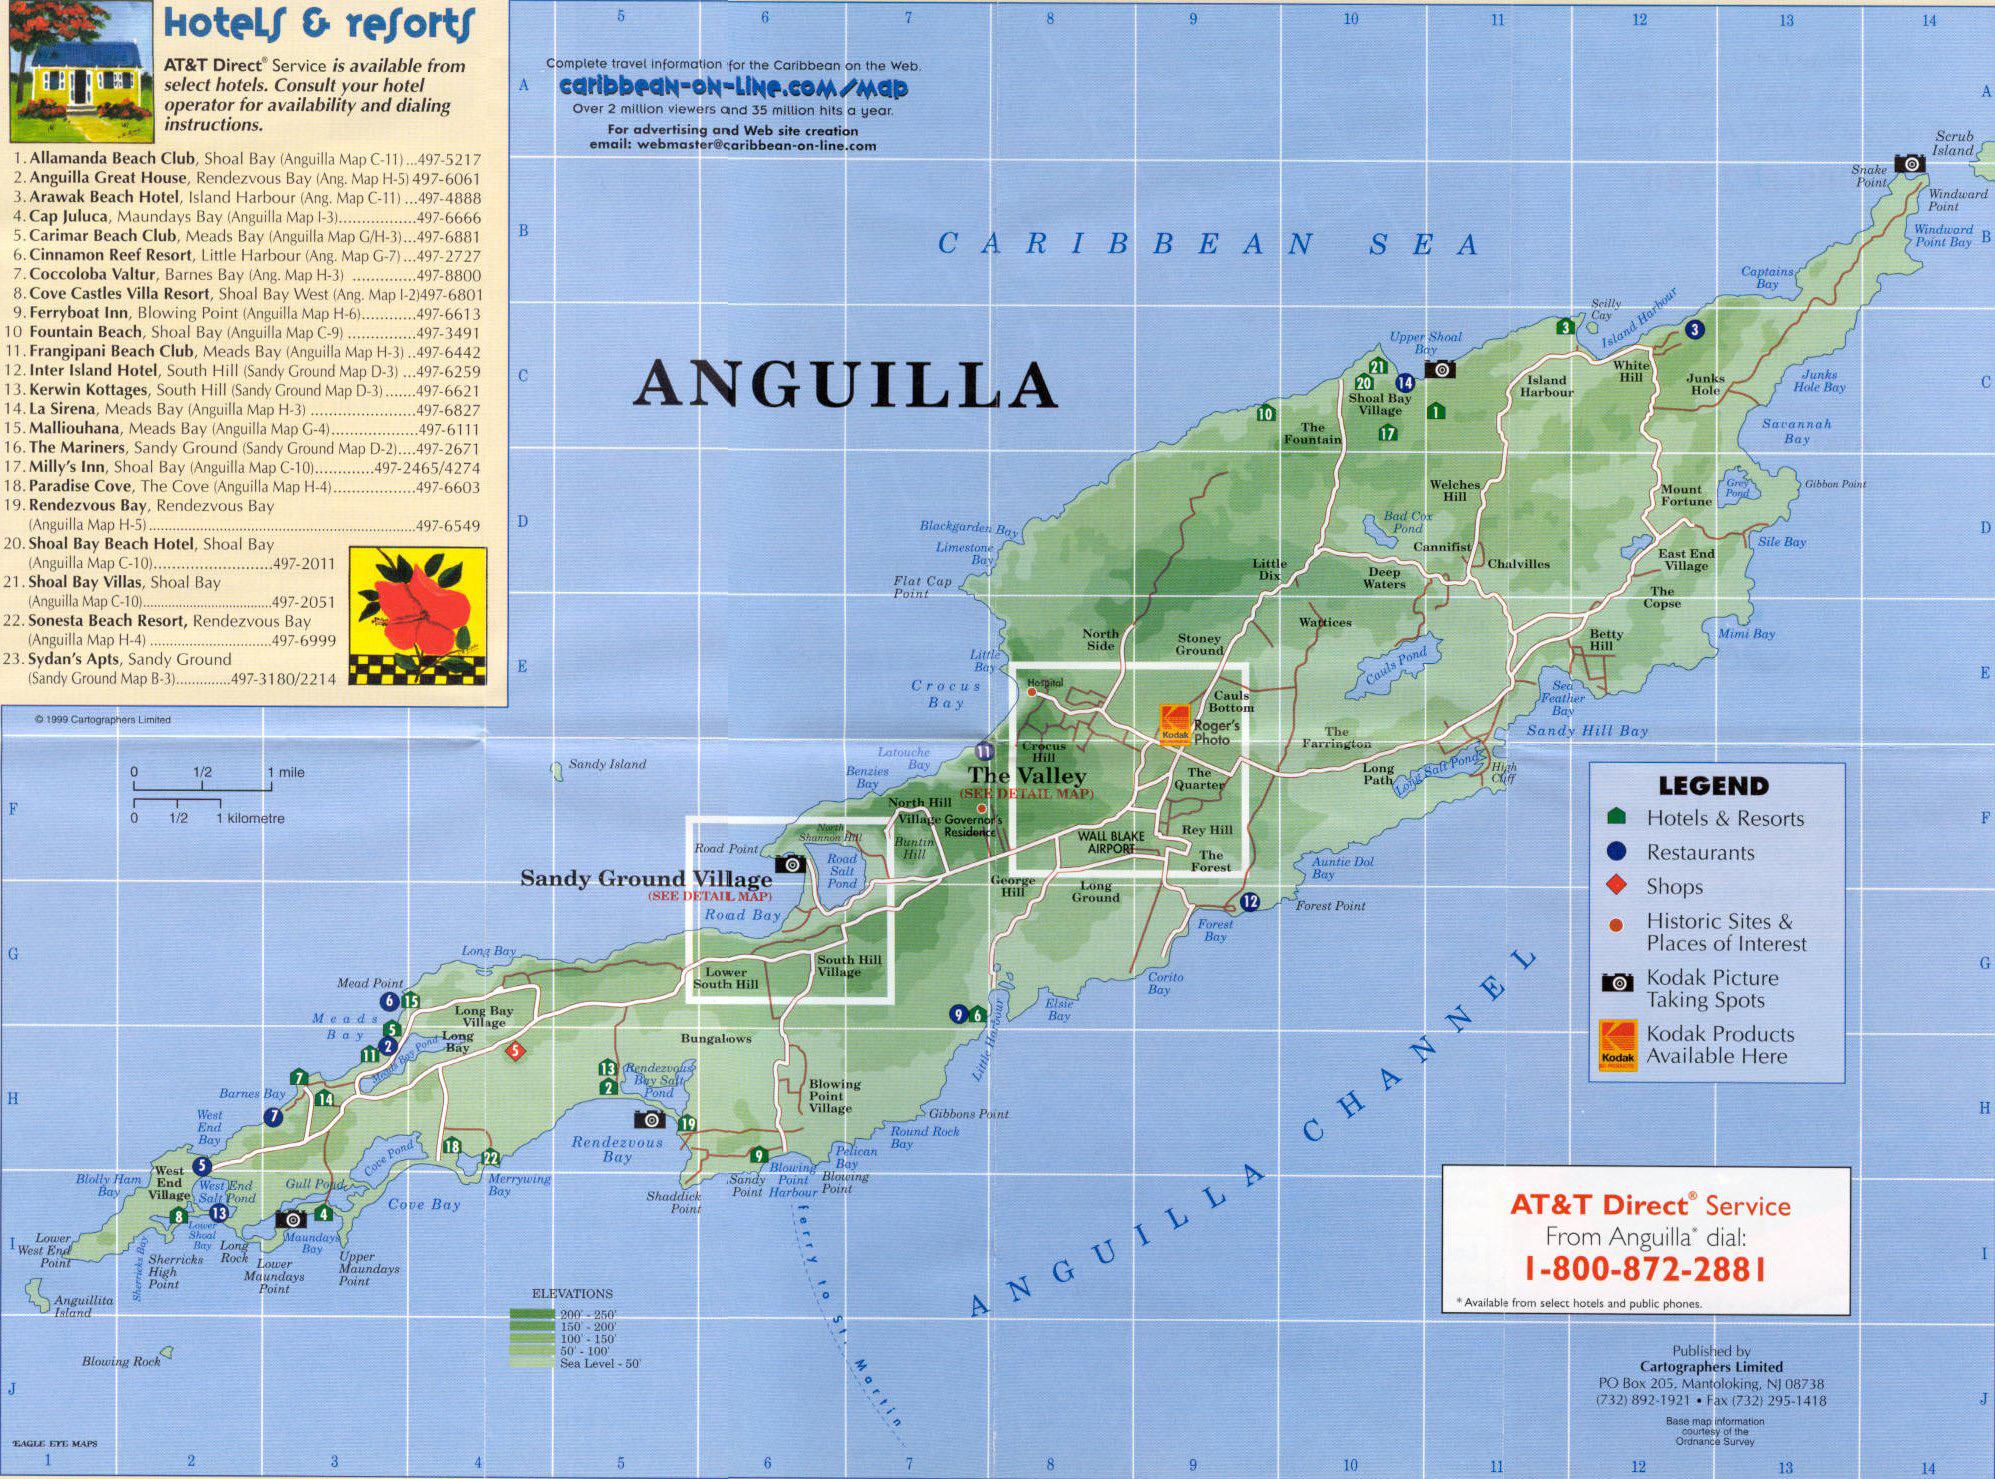 Shipping to Anguilla